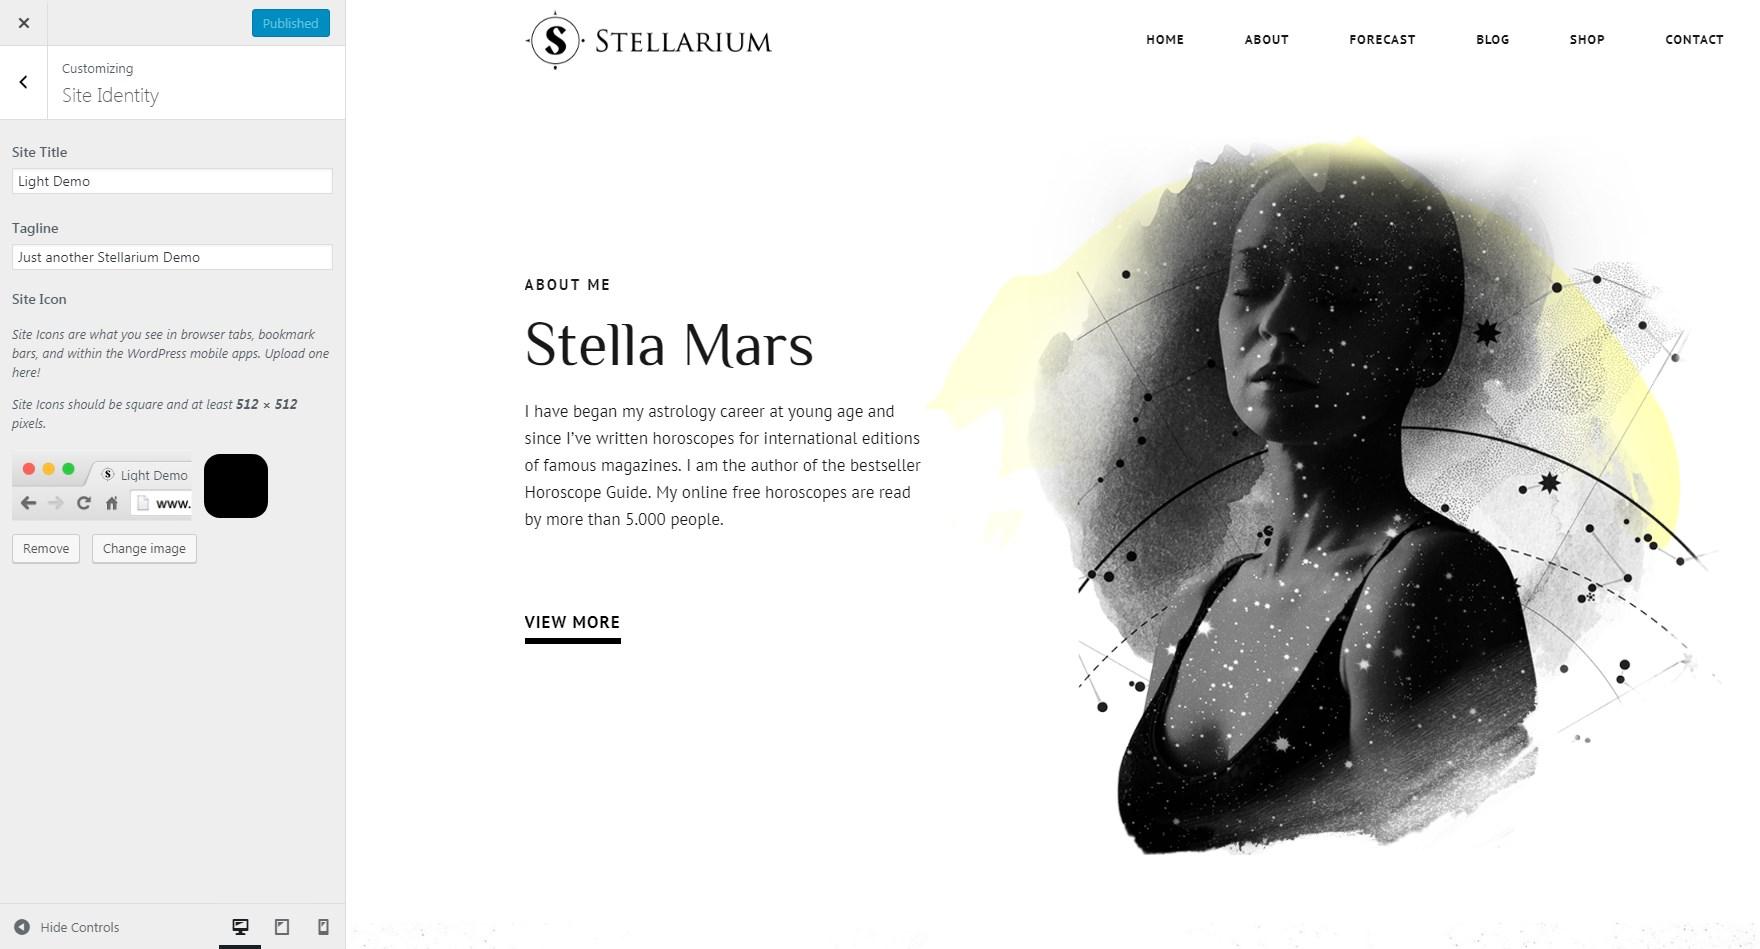 https://documentation.bold-themes.com/stellarium/wp-content/uploads/sites/34/2018/06/stellarium-customize-04.jpg